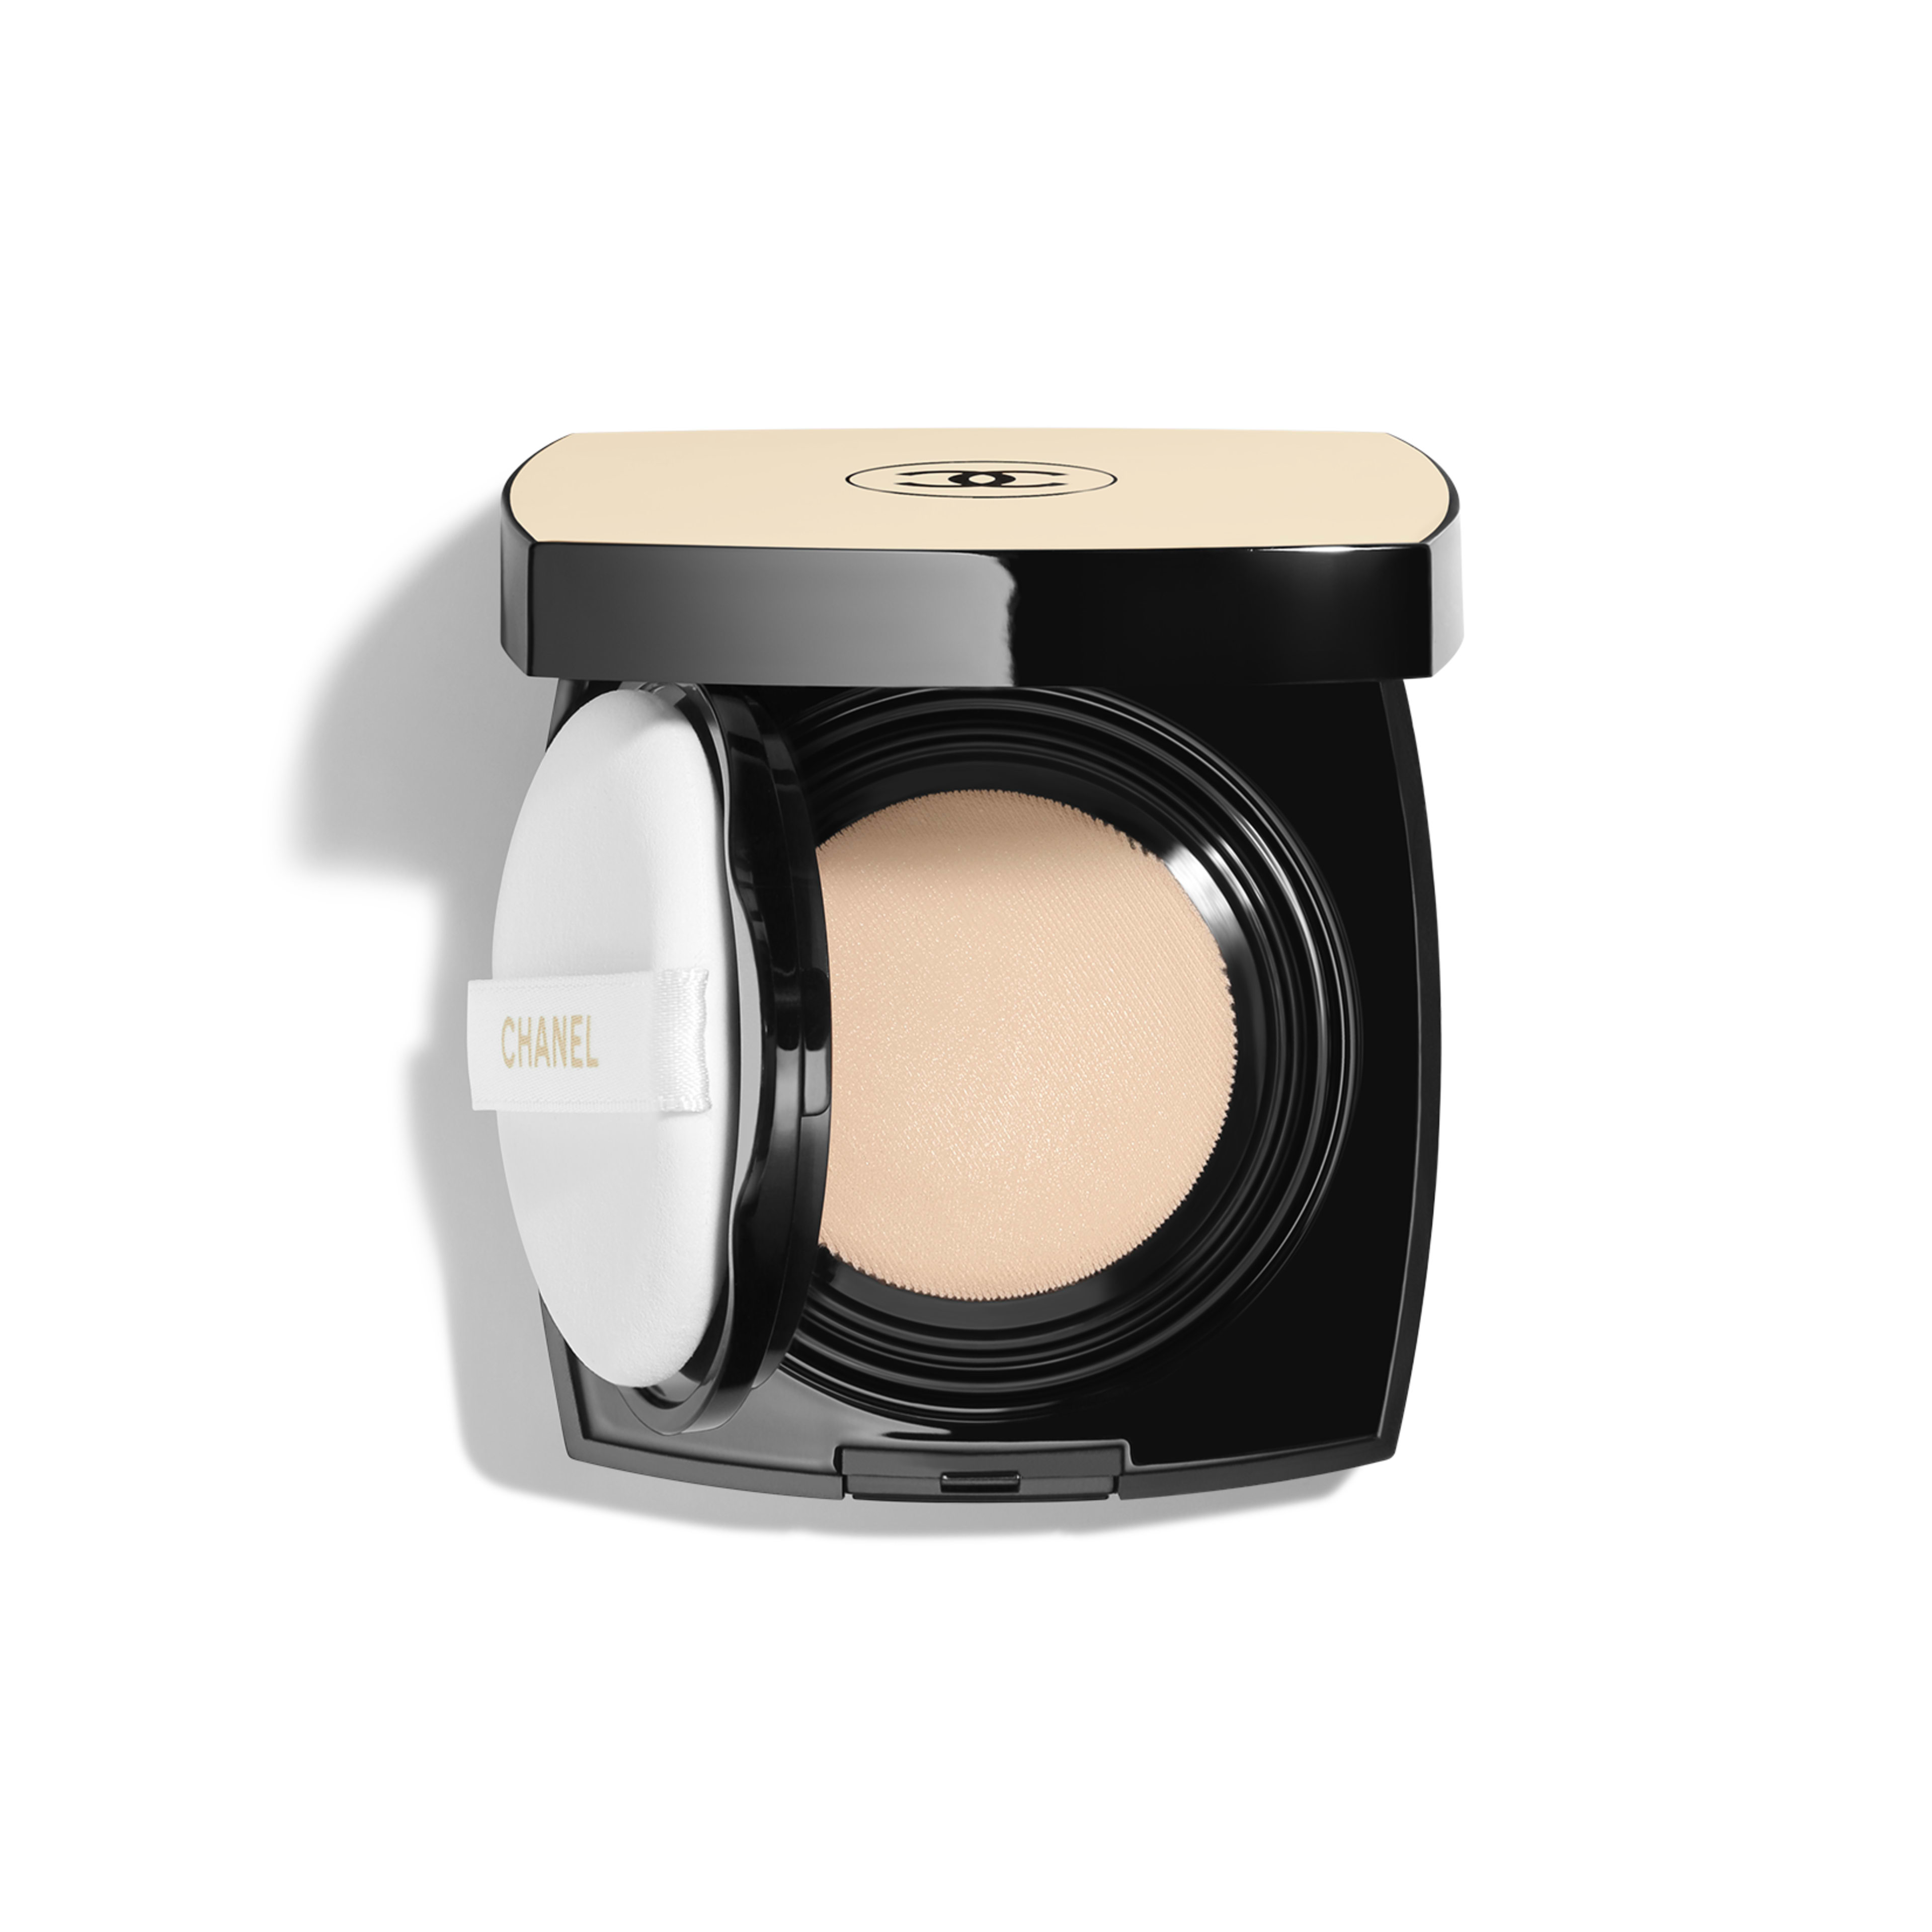 LES BEIGES - makeup - 11g - 預設視圖